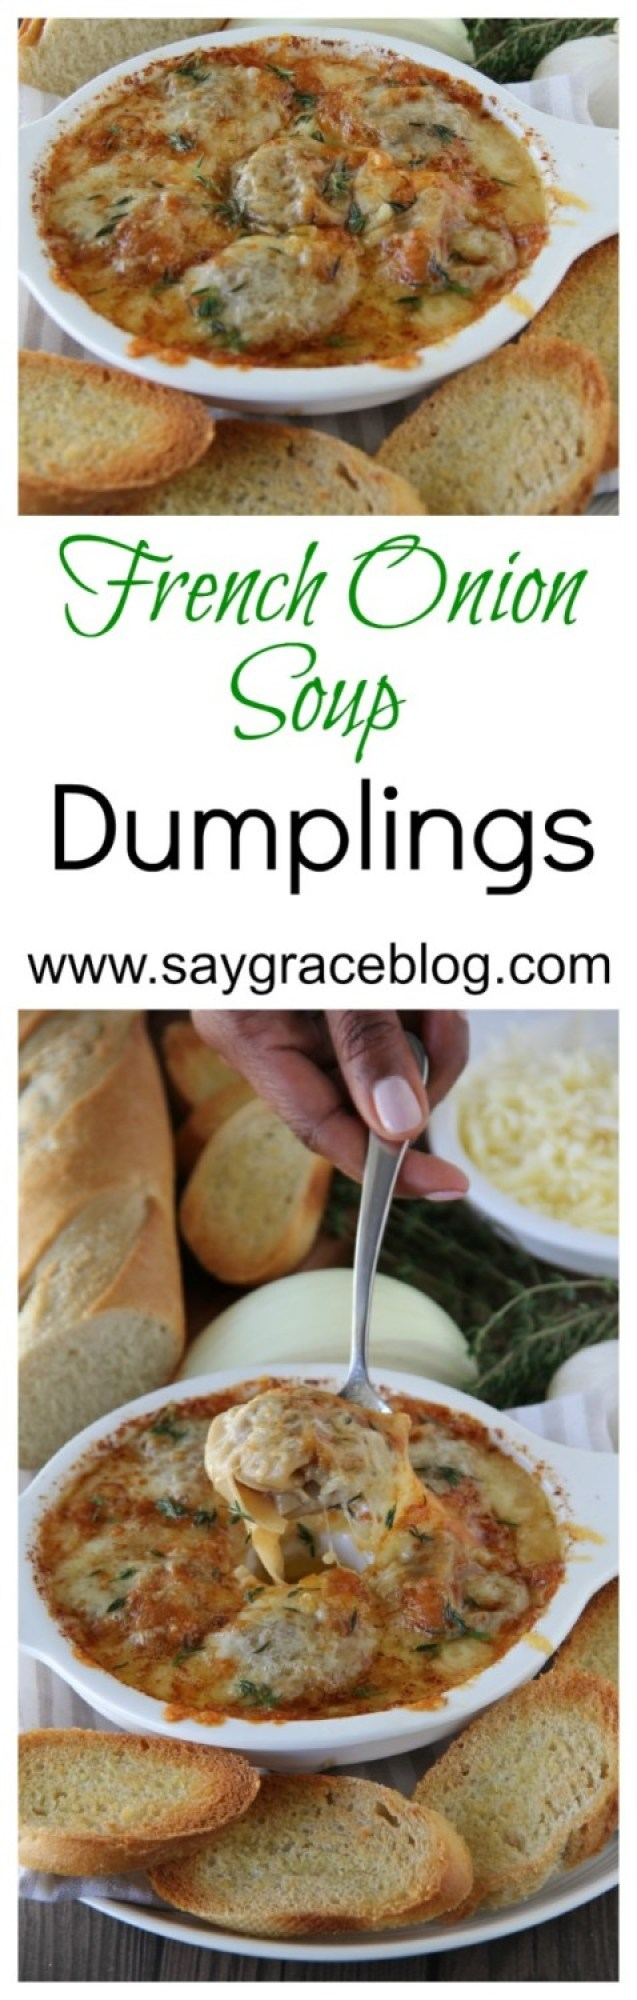 French Onion Soup Dumplings